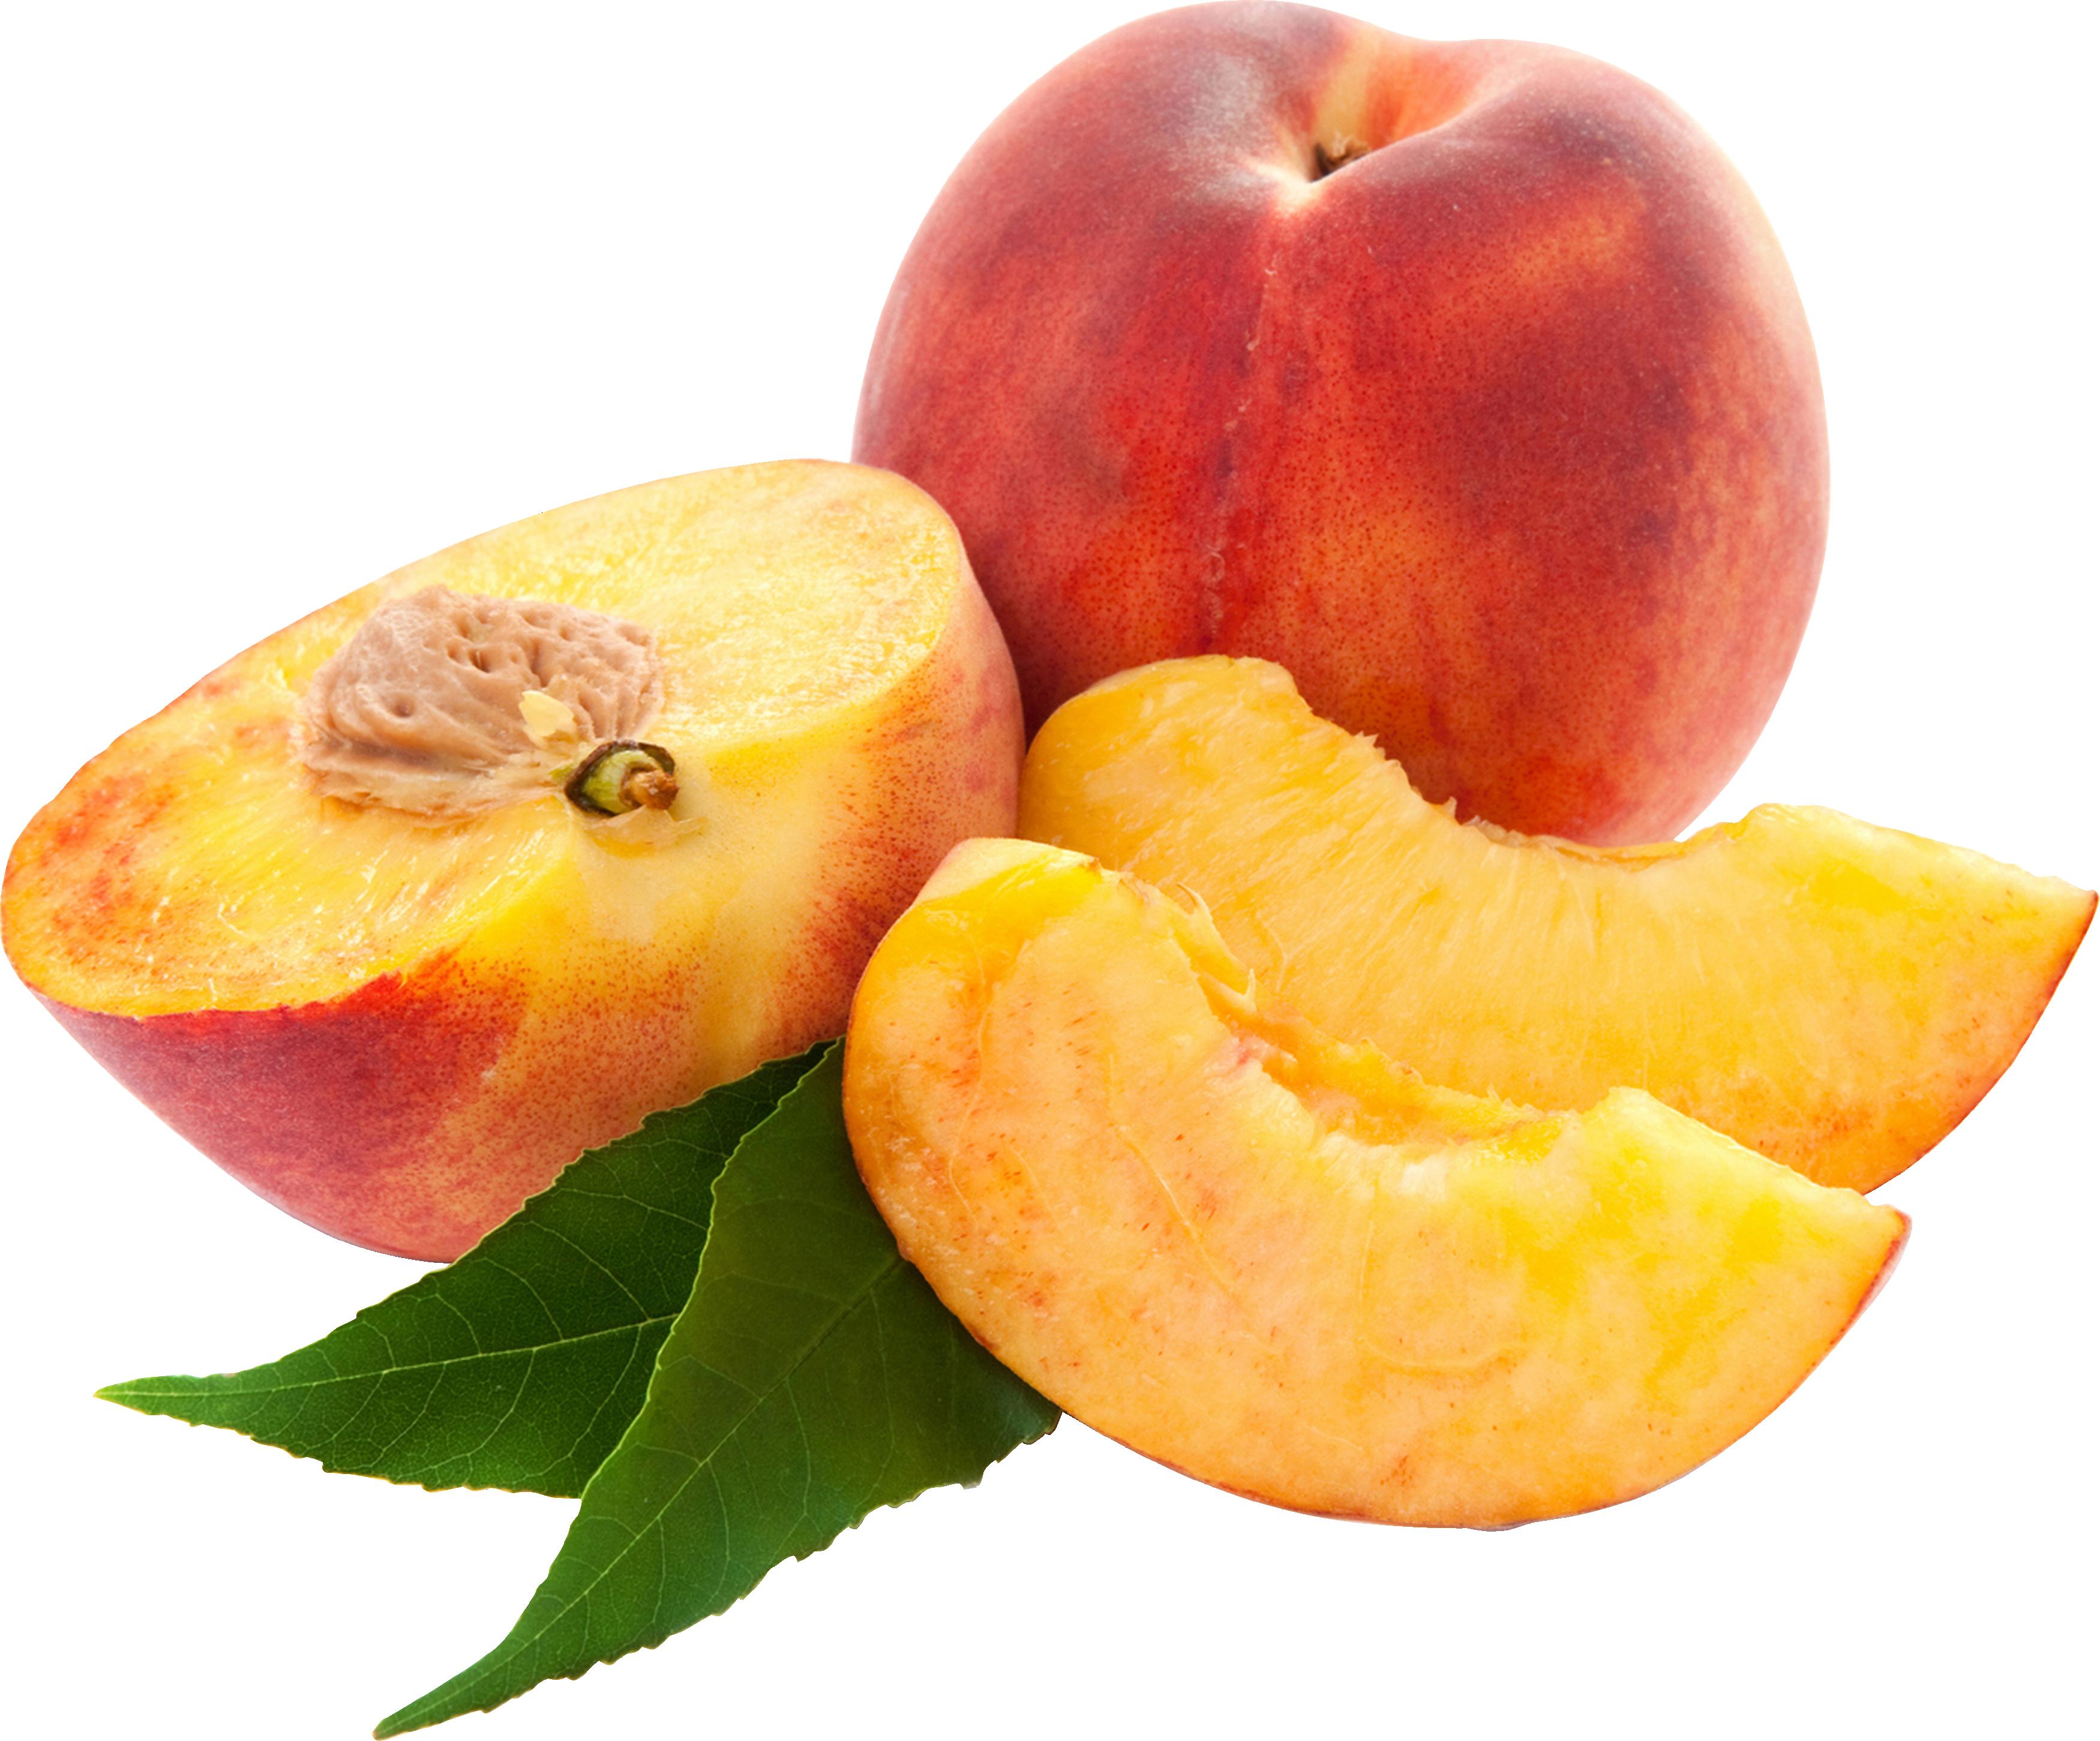 Peach Fruit Border Clipart - Clipart Suggest